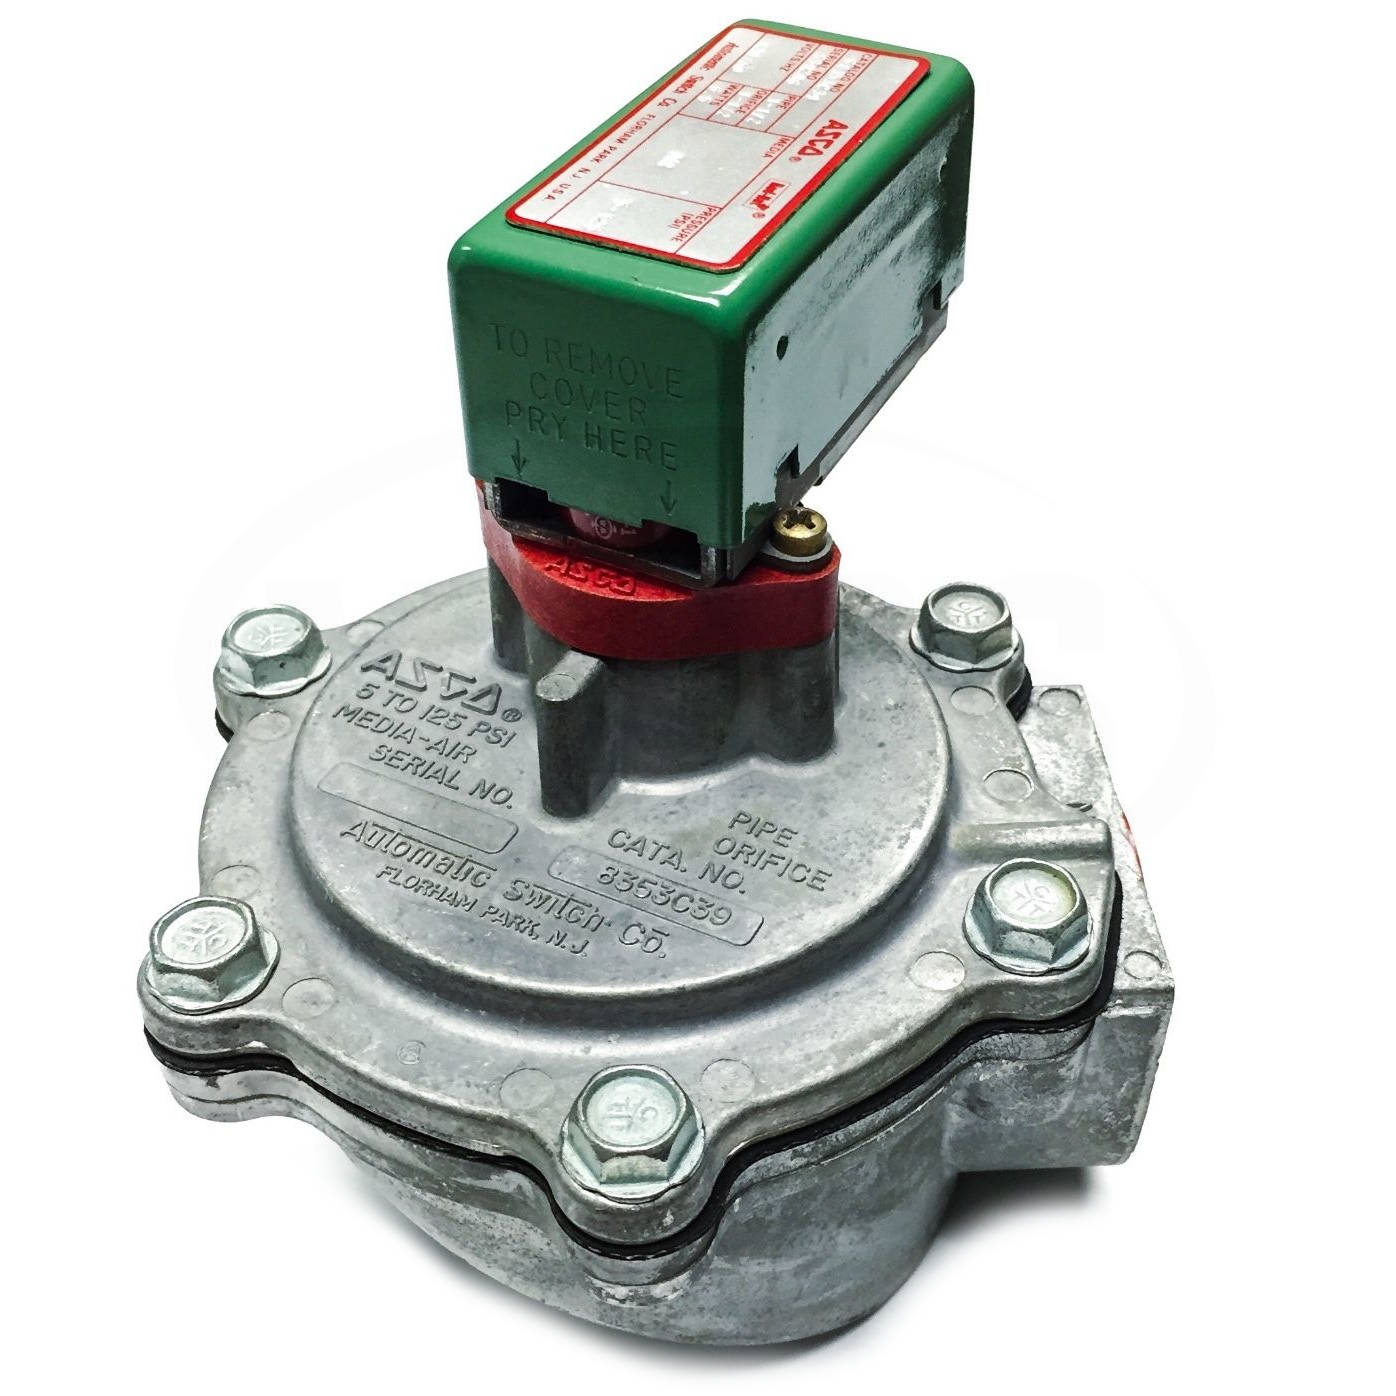 asco red hat 8316g064 wiring diagram foot nerve endings s8353c39 solenoid valve